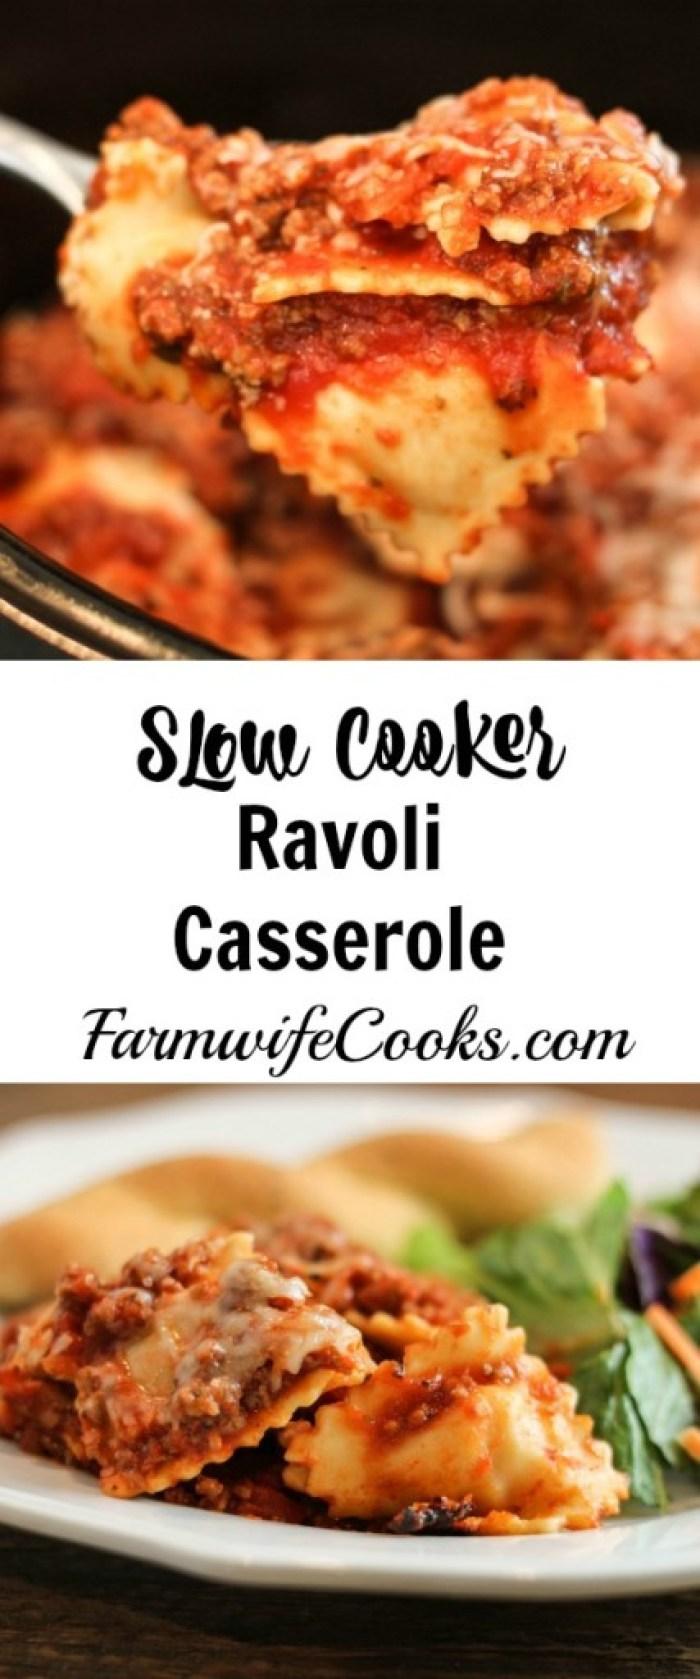 Slow Cooker Ravioli Casserole